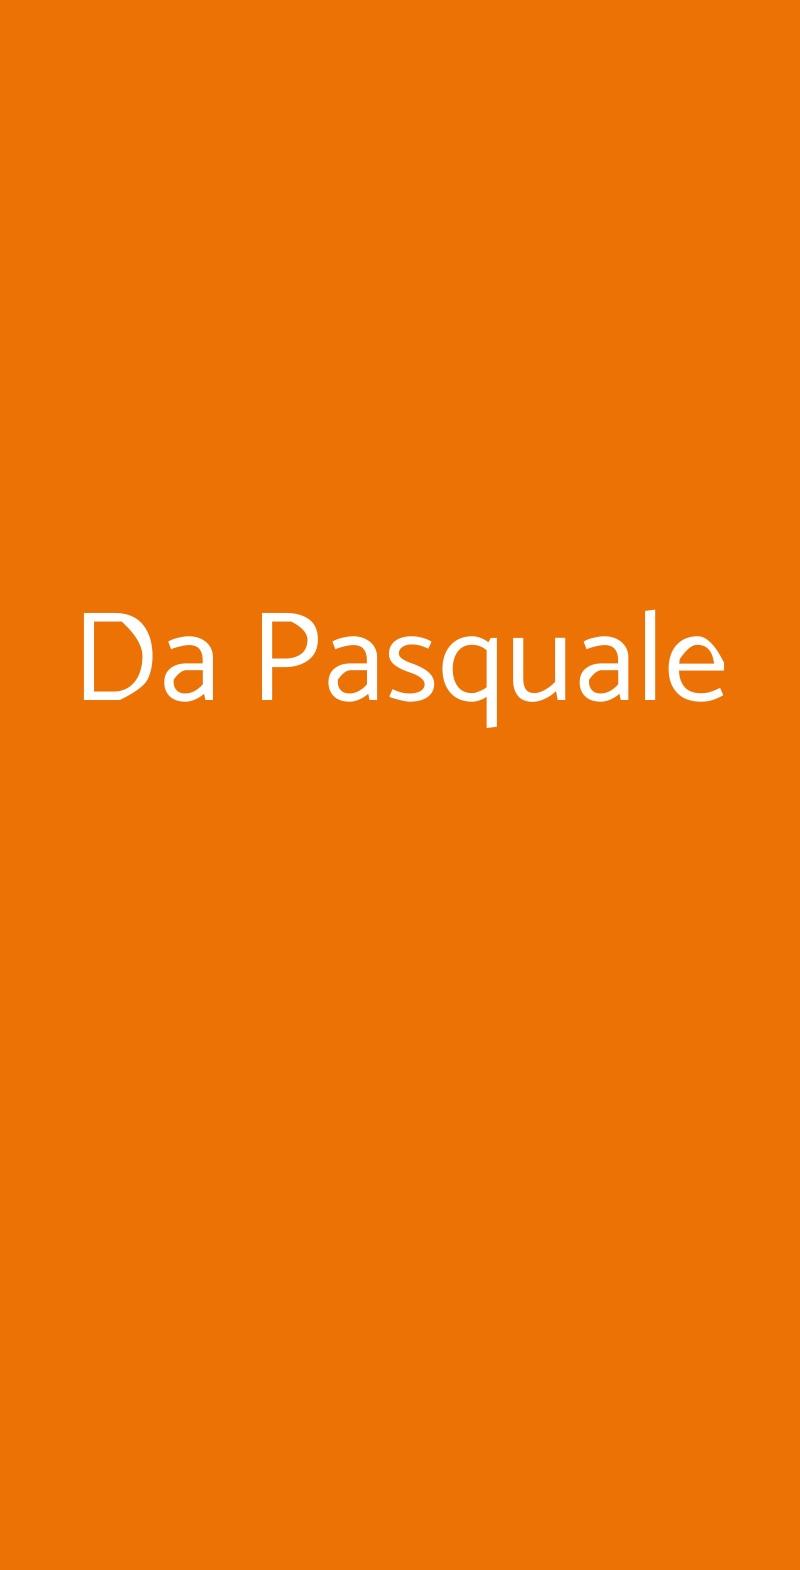 Da Pasquale Capri menù 1 pagina